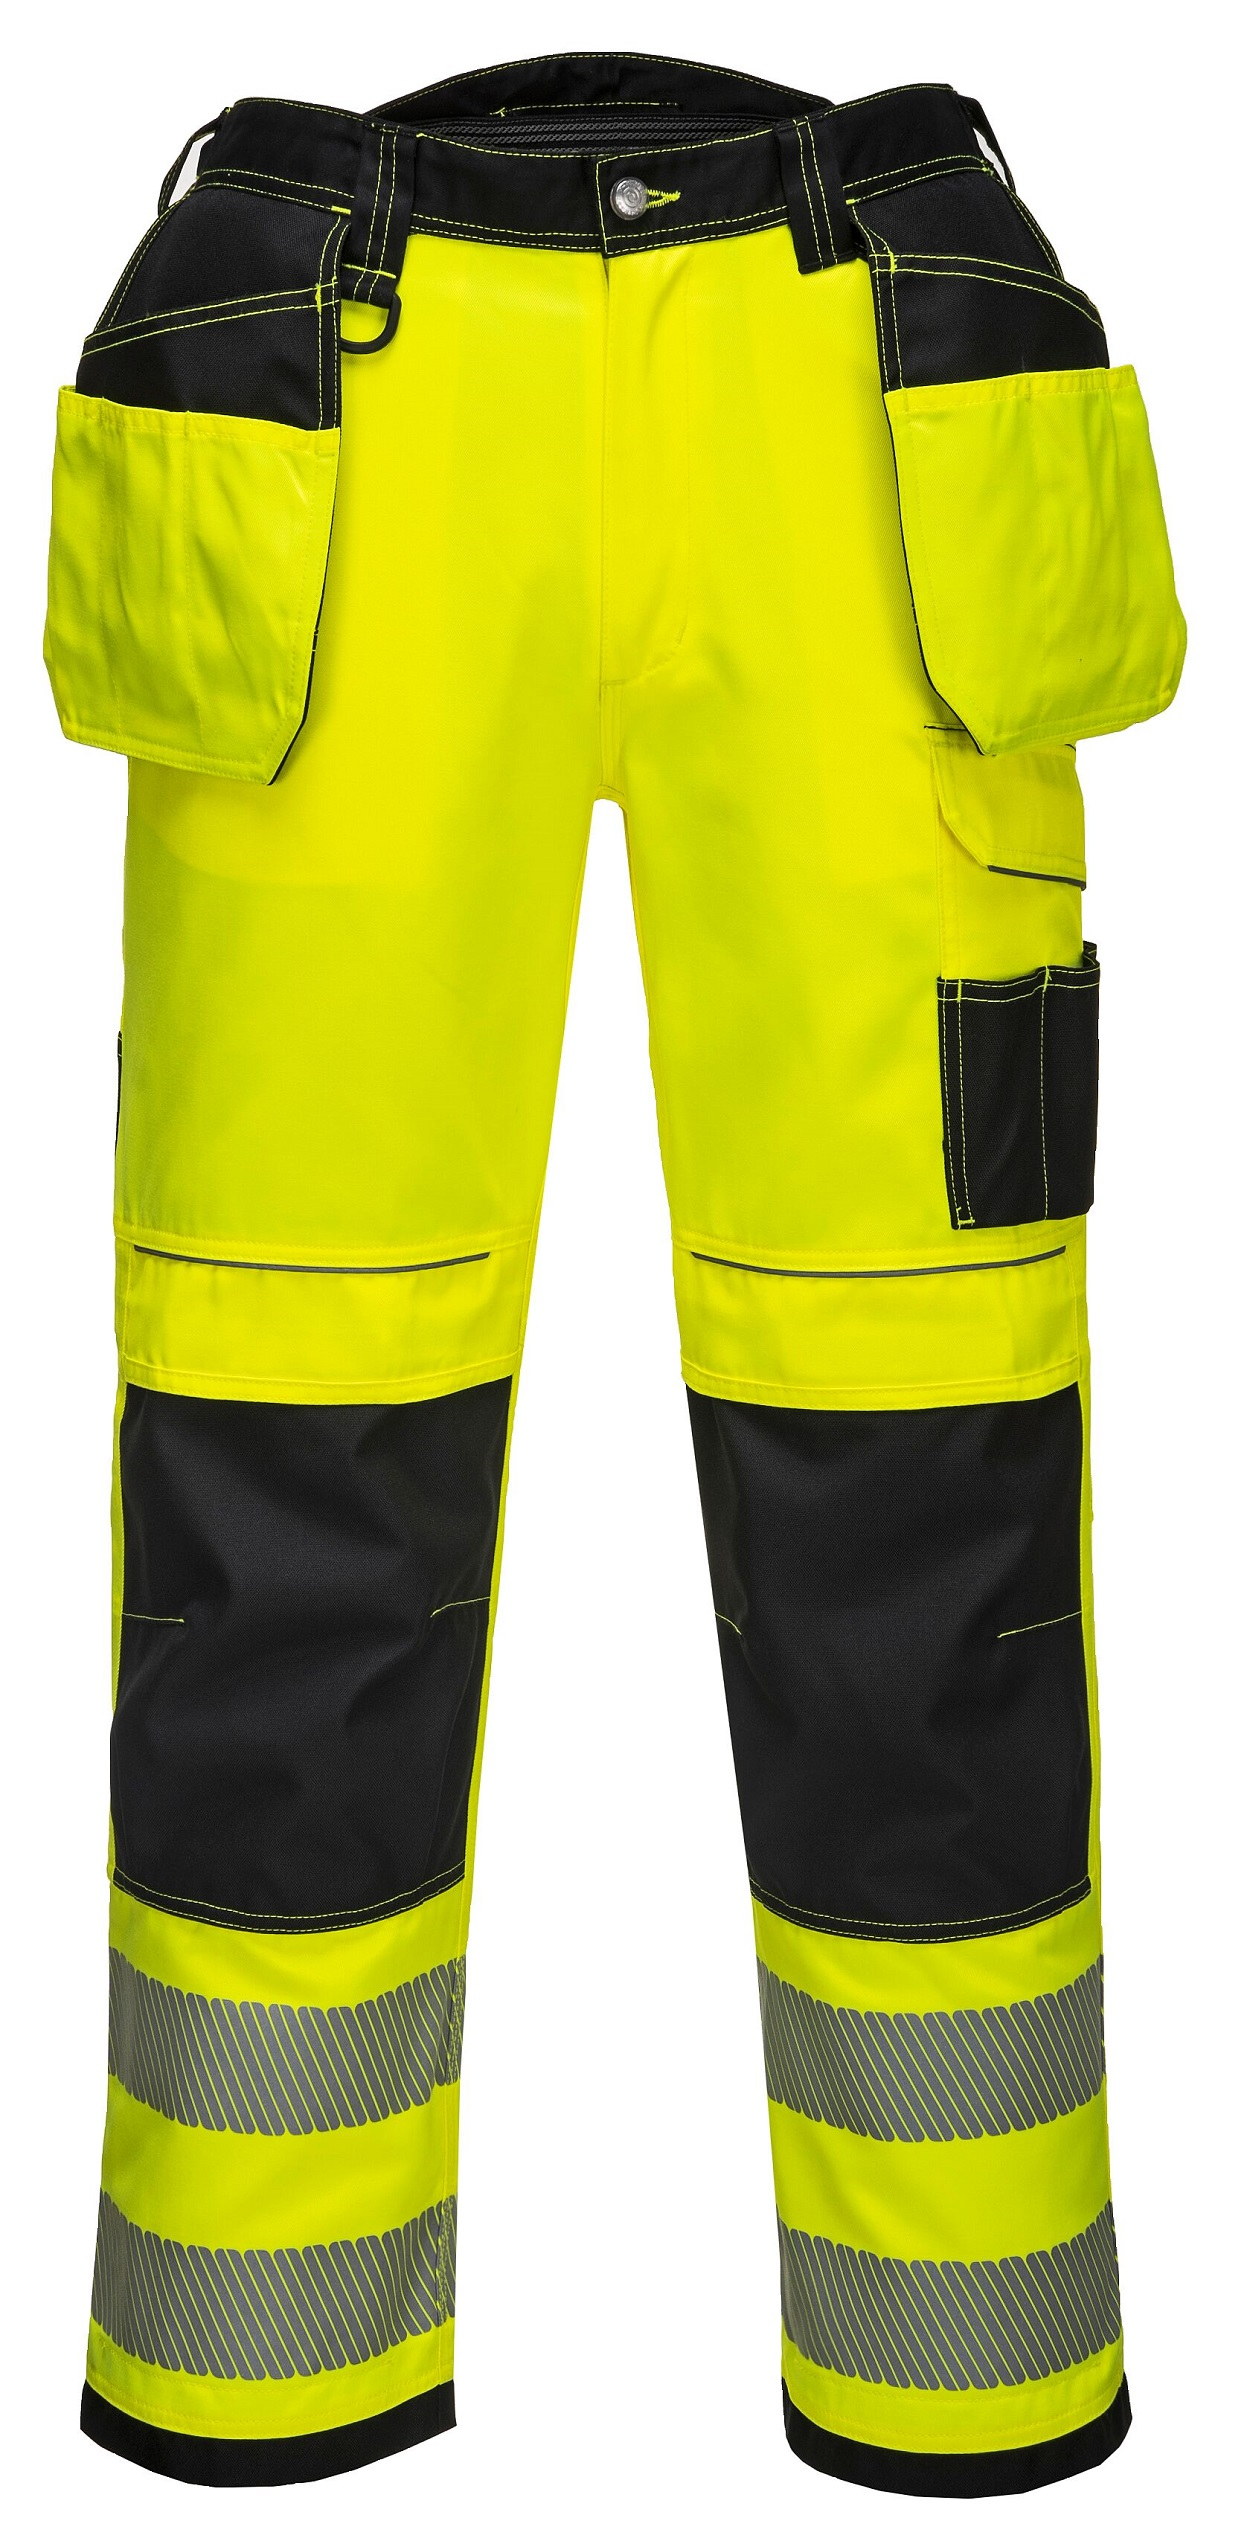 T501-yellow-1